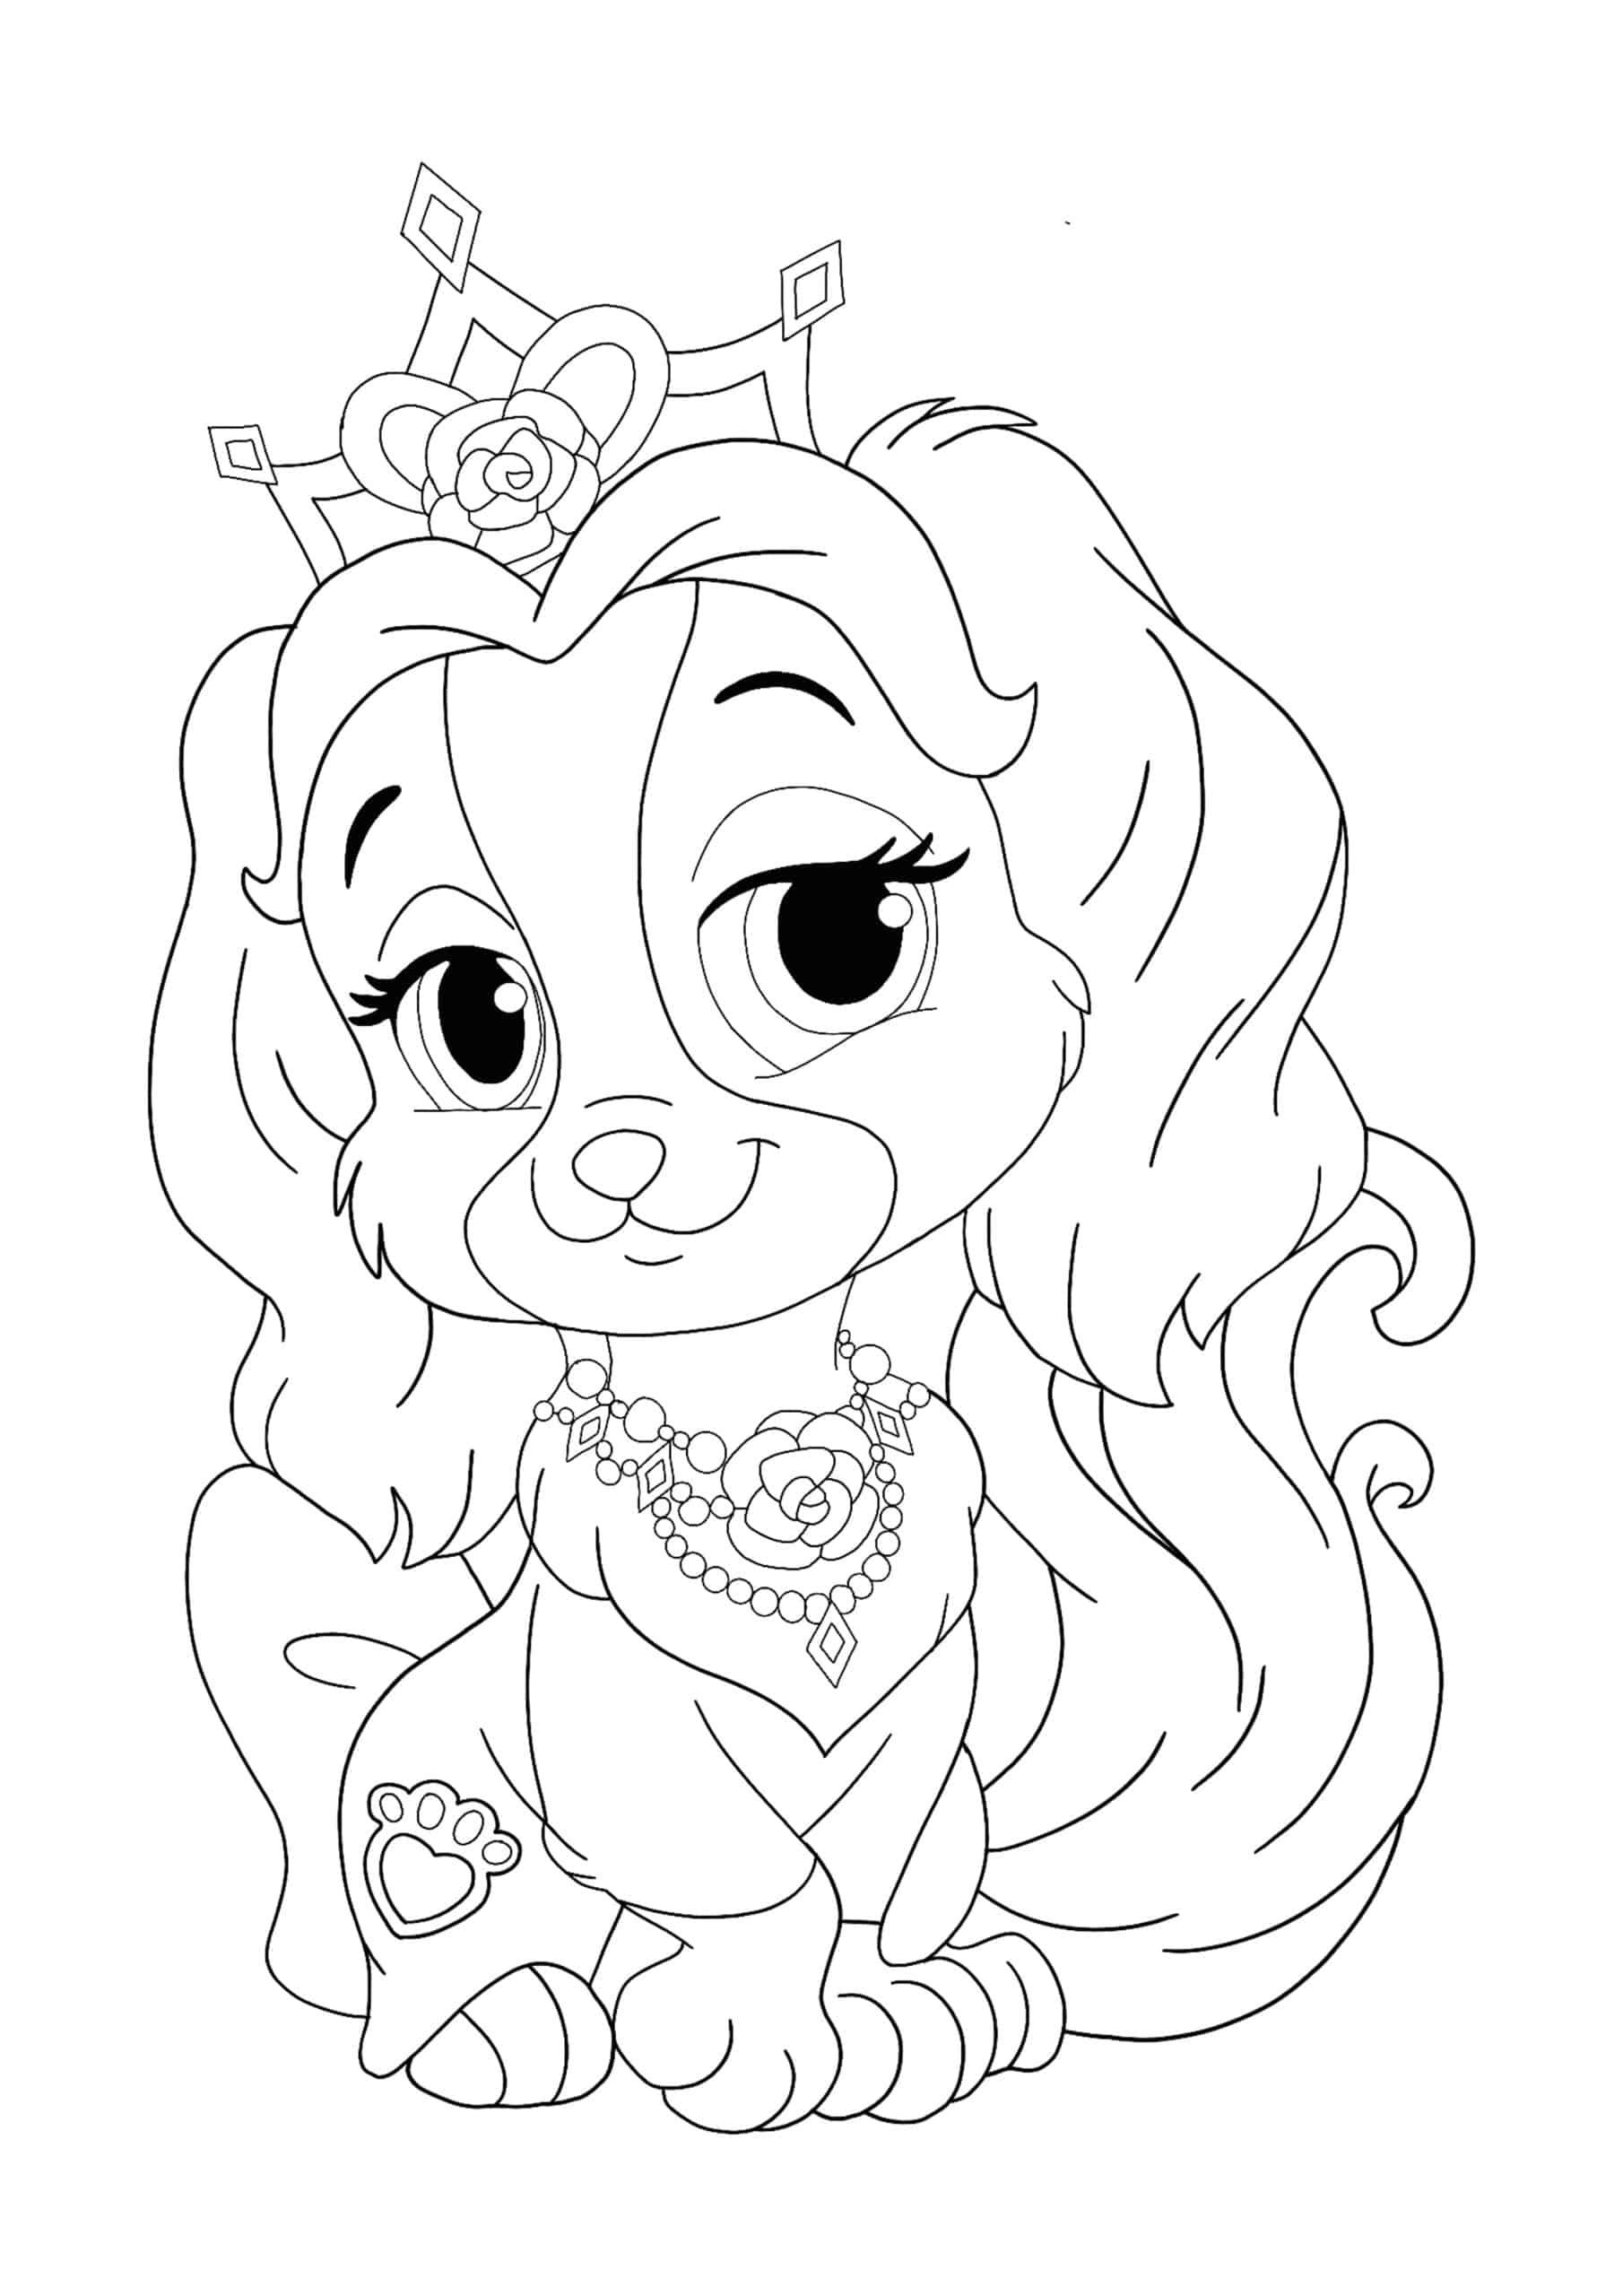 Disney Princess Palace Pets Teacup coloring page